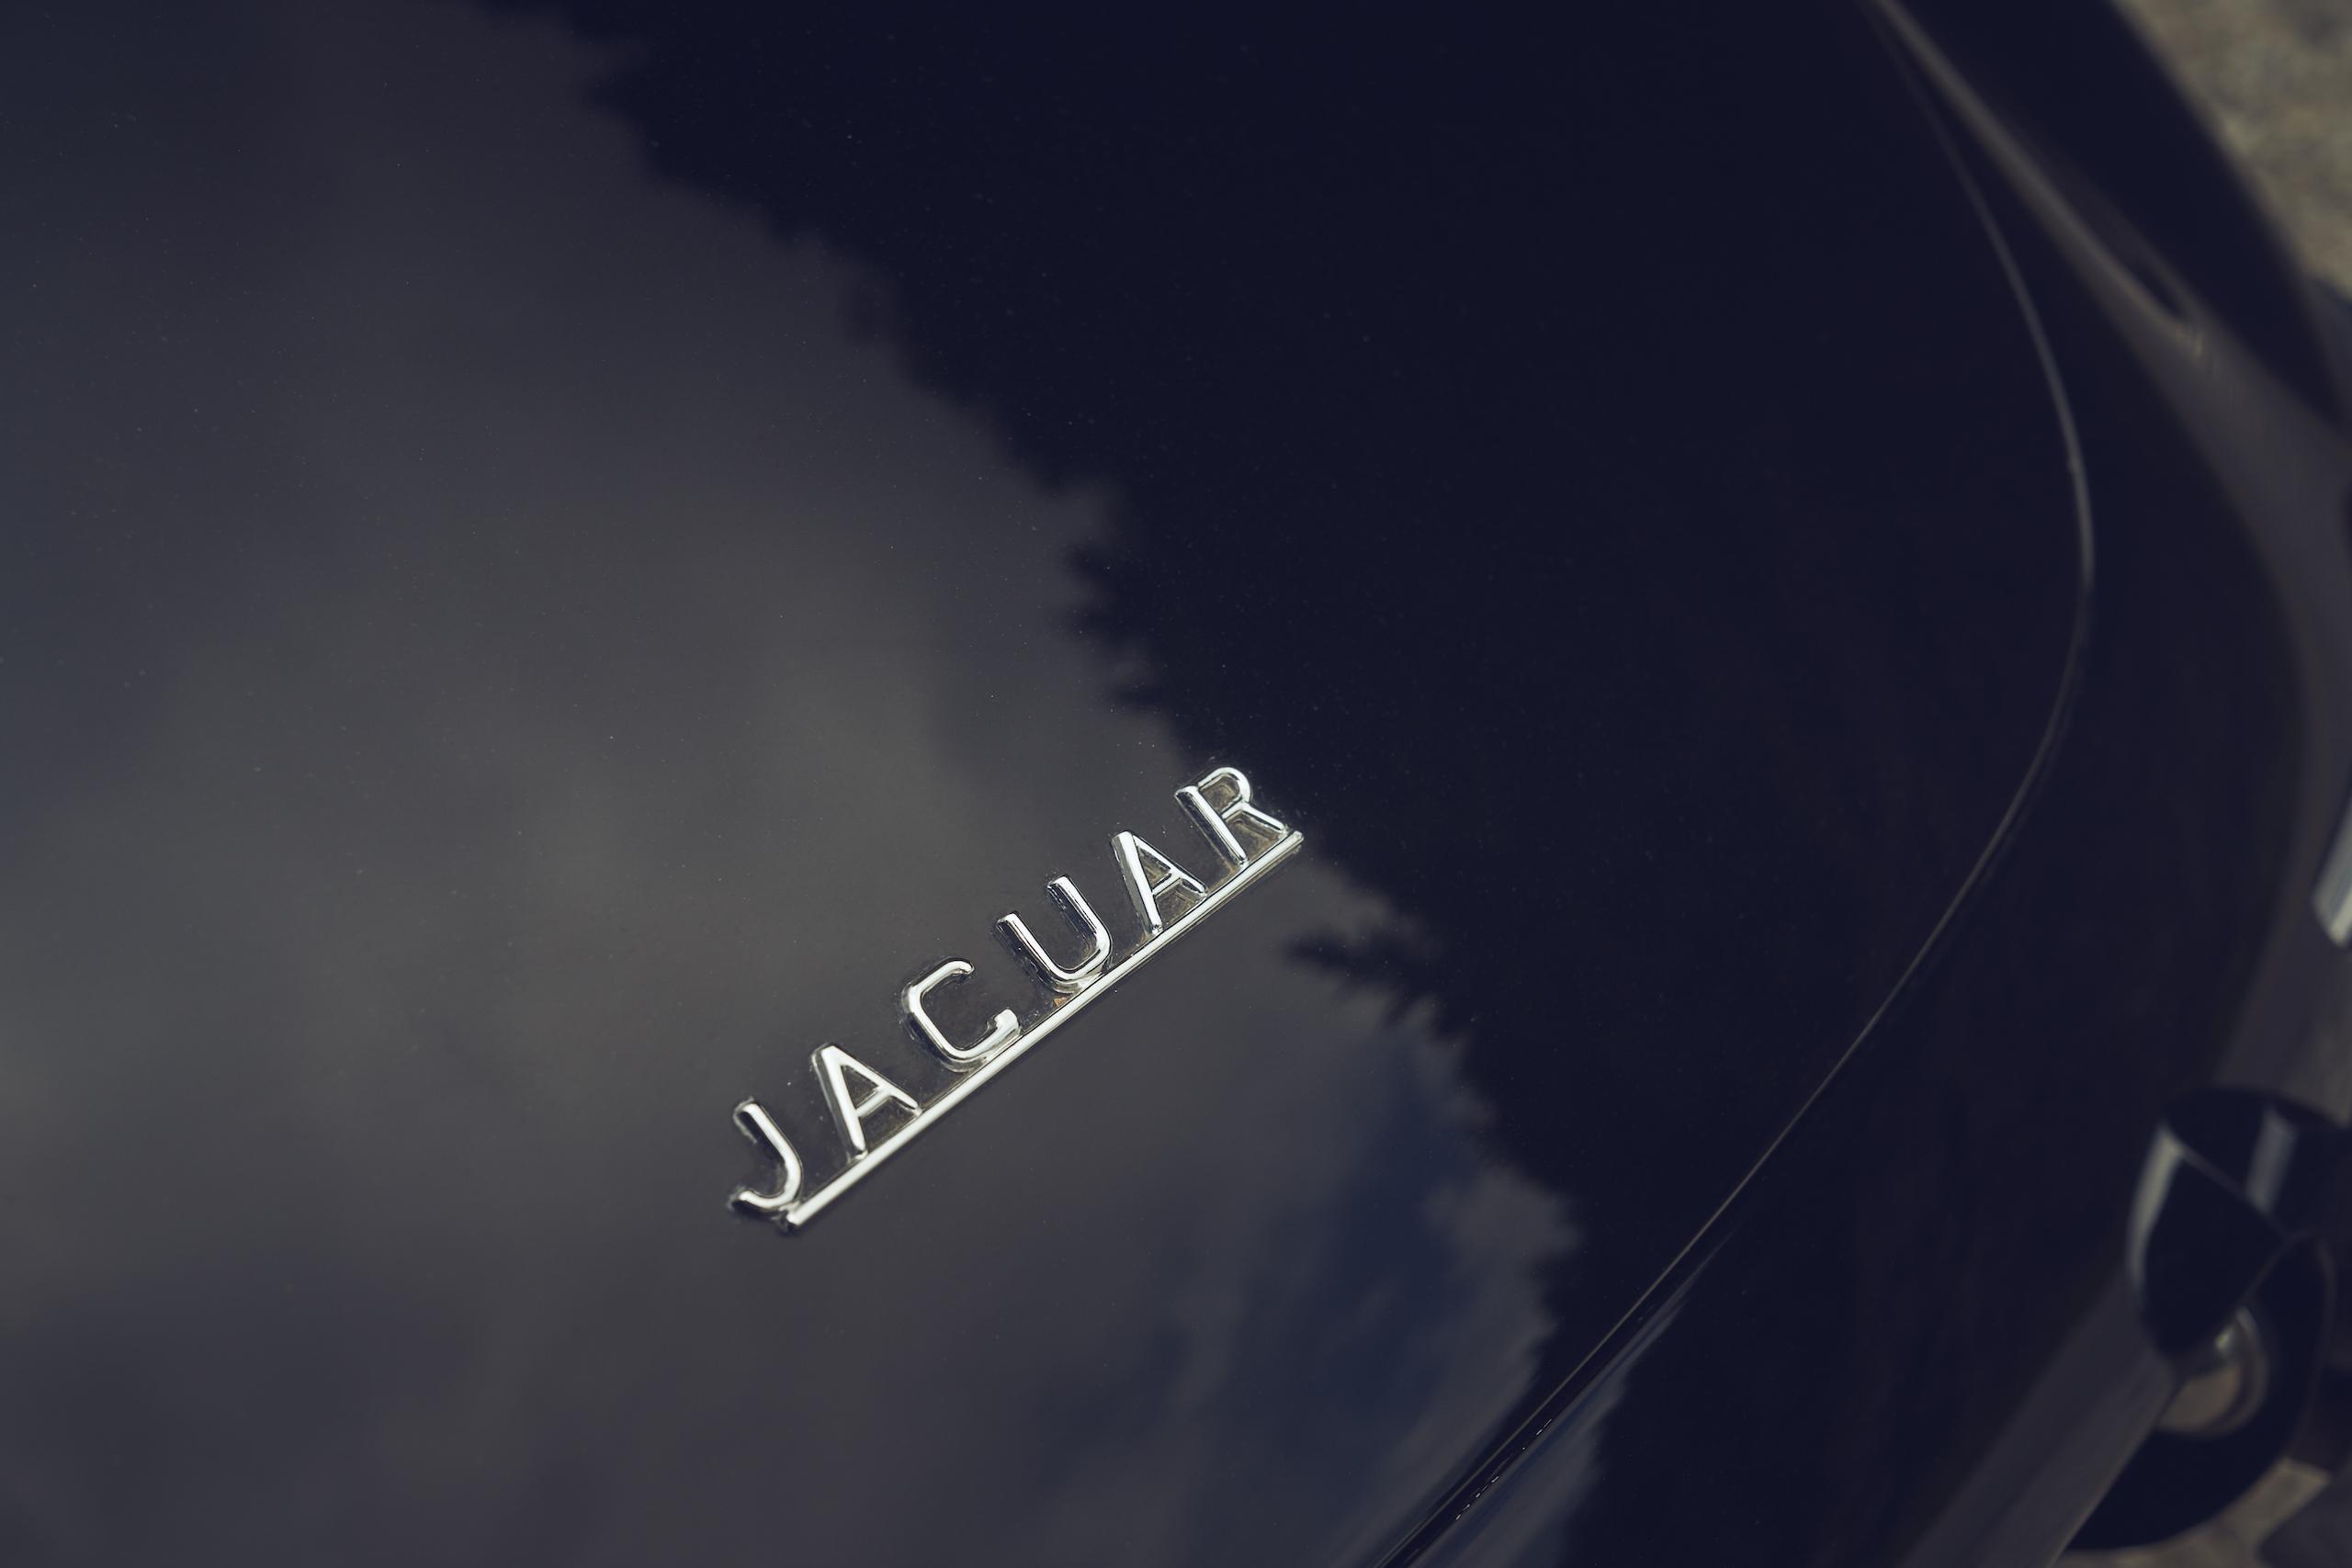 Jaguar E-Type rear badging letters